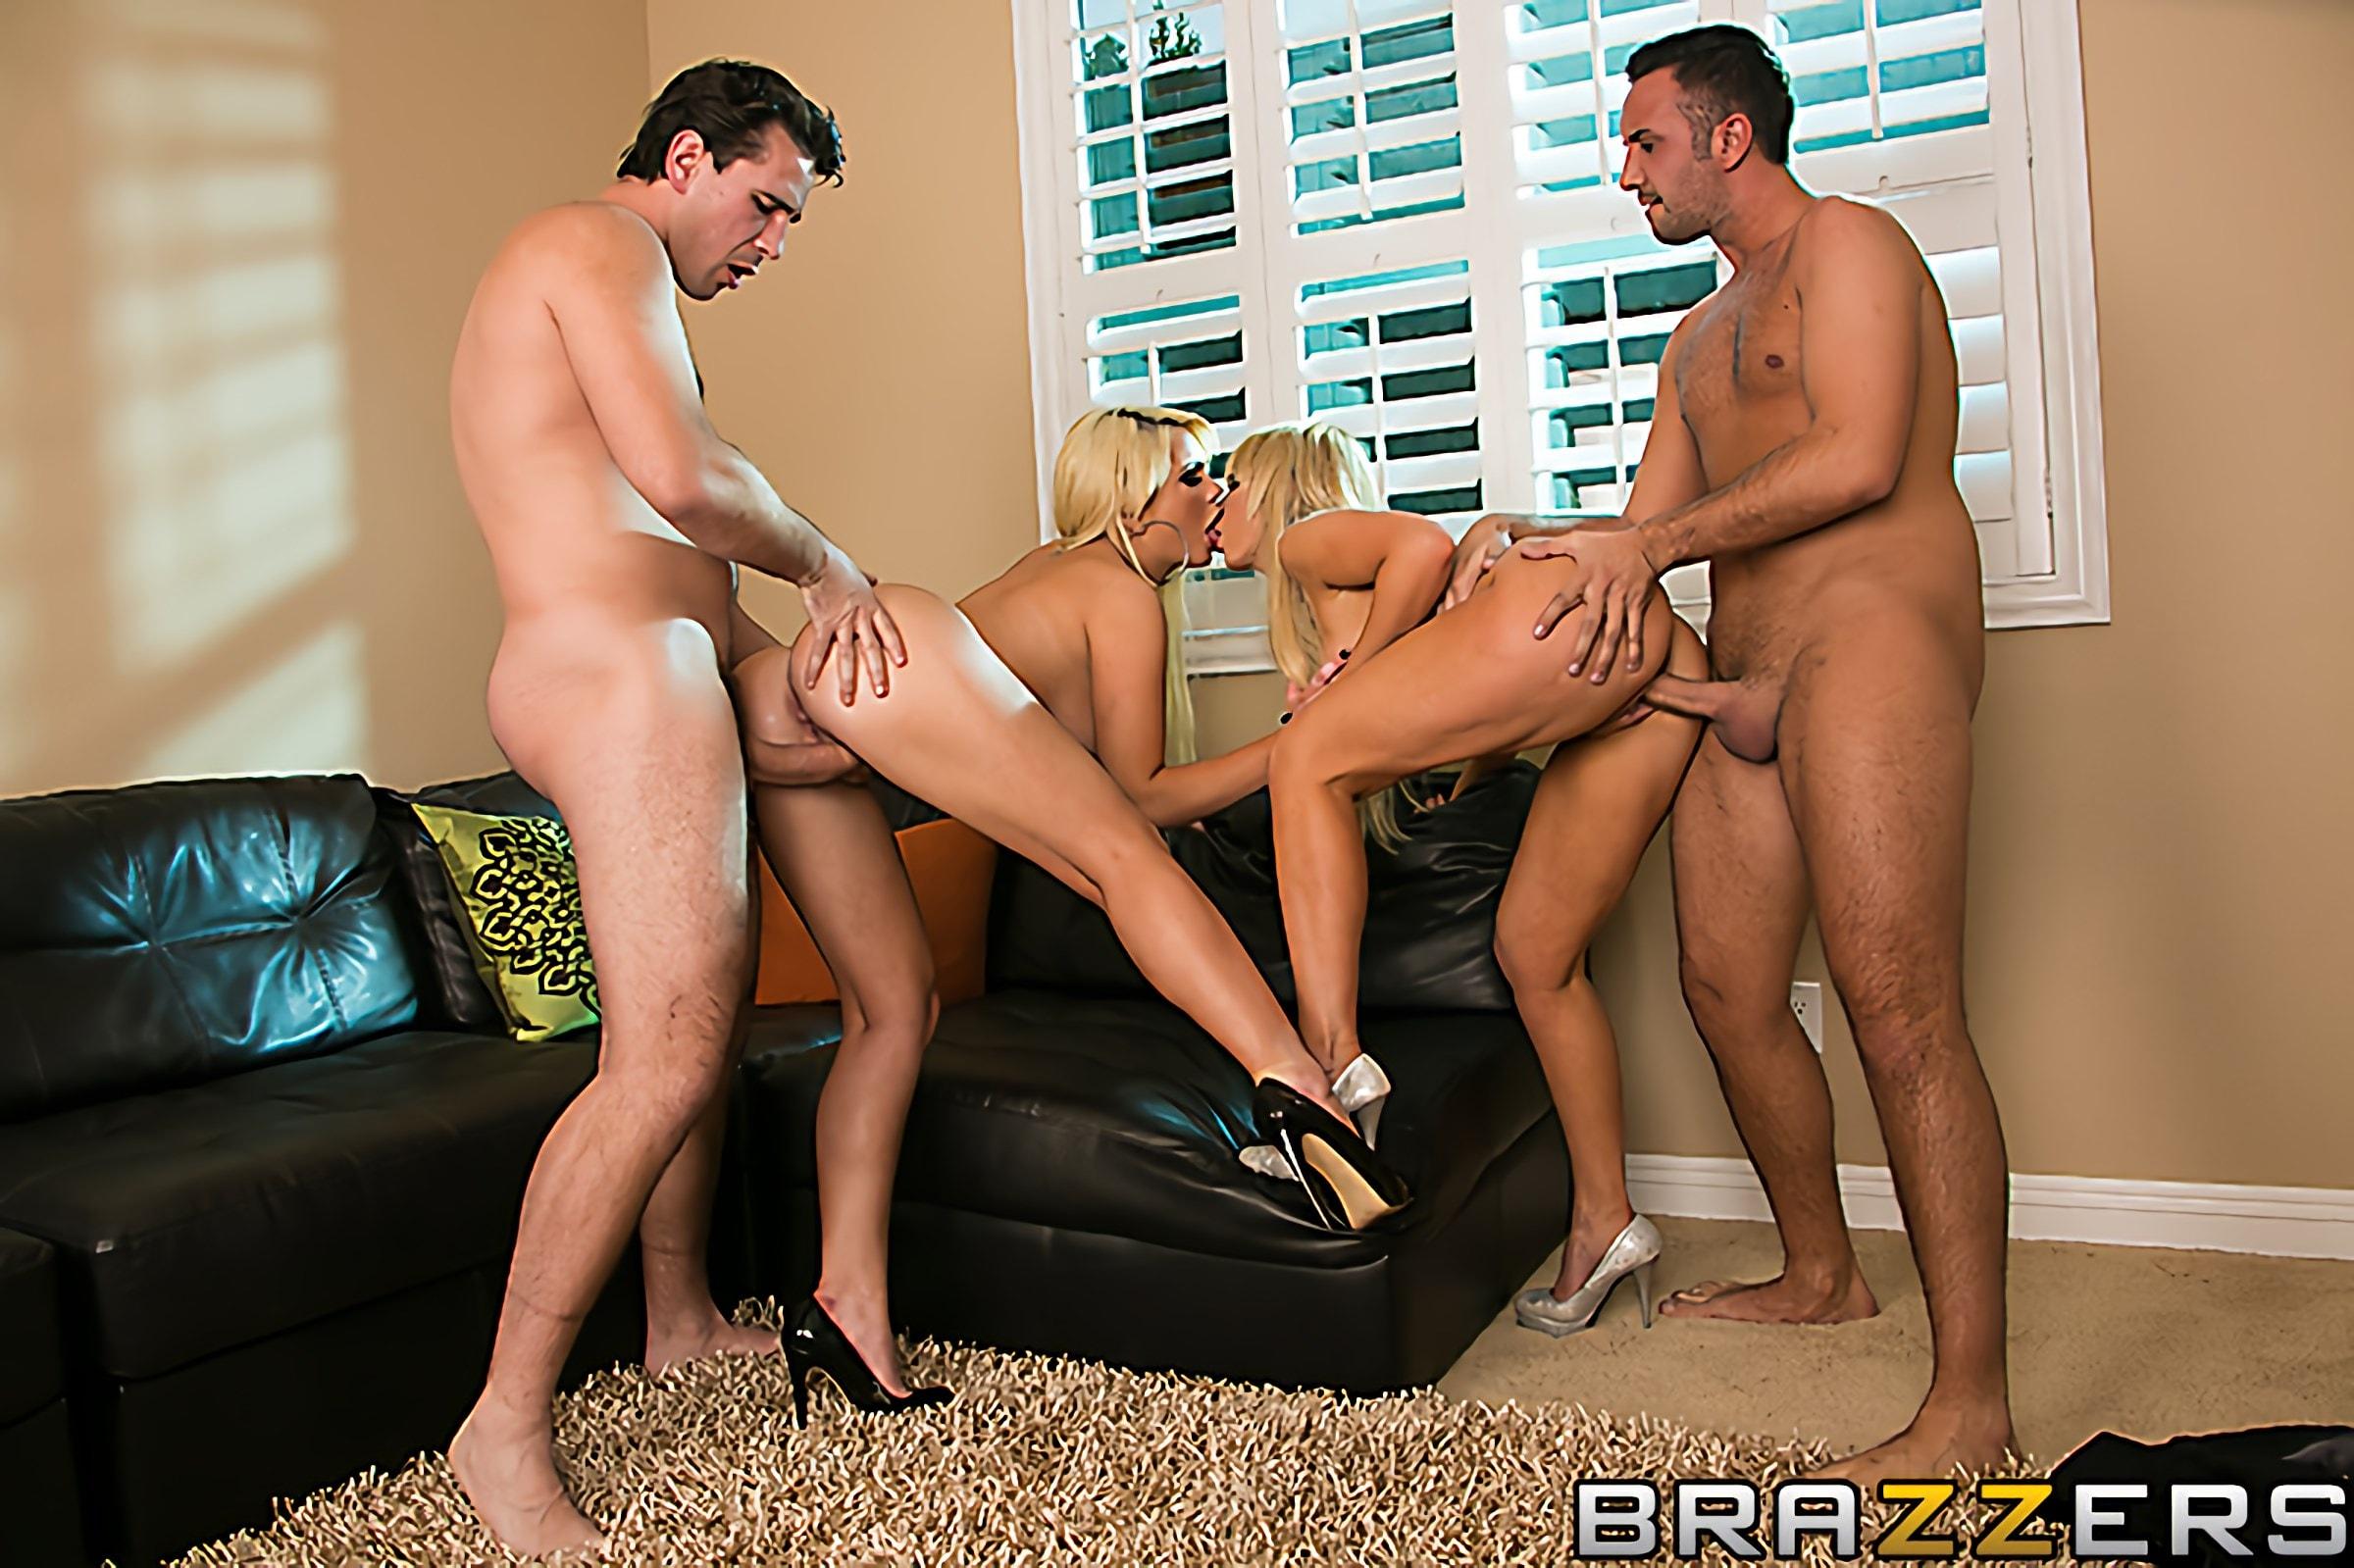 Brazzers 'A Brazzers New Years Eve' starring Nikki Benz (Photo 5)